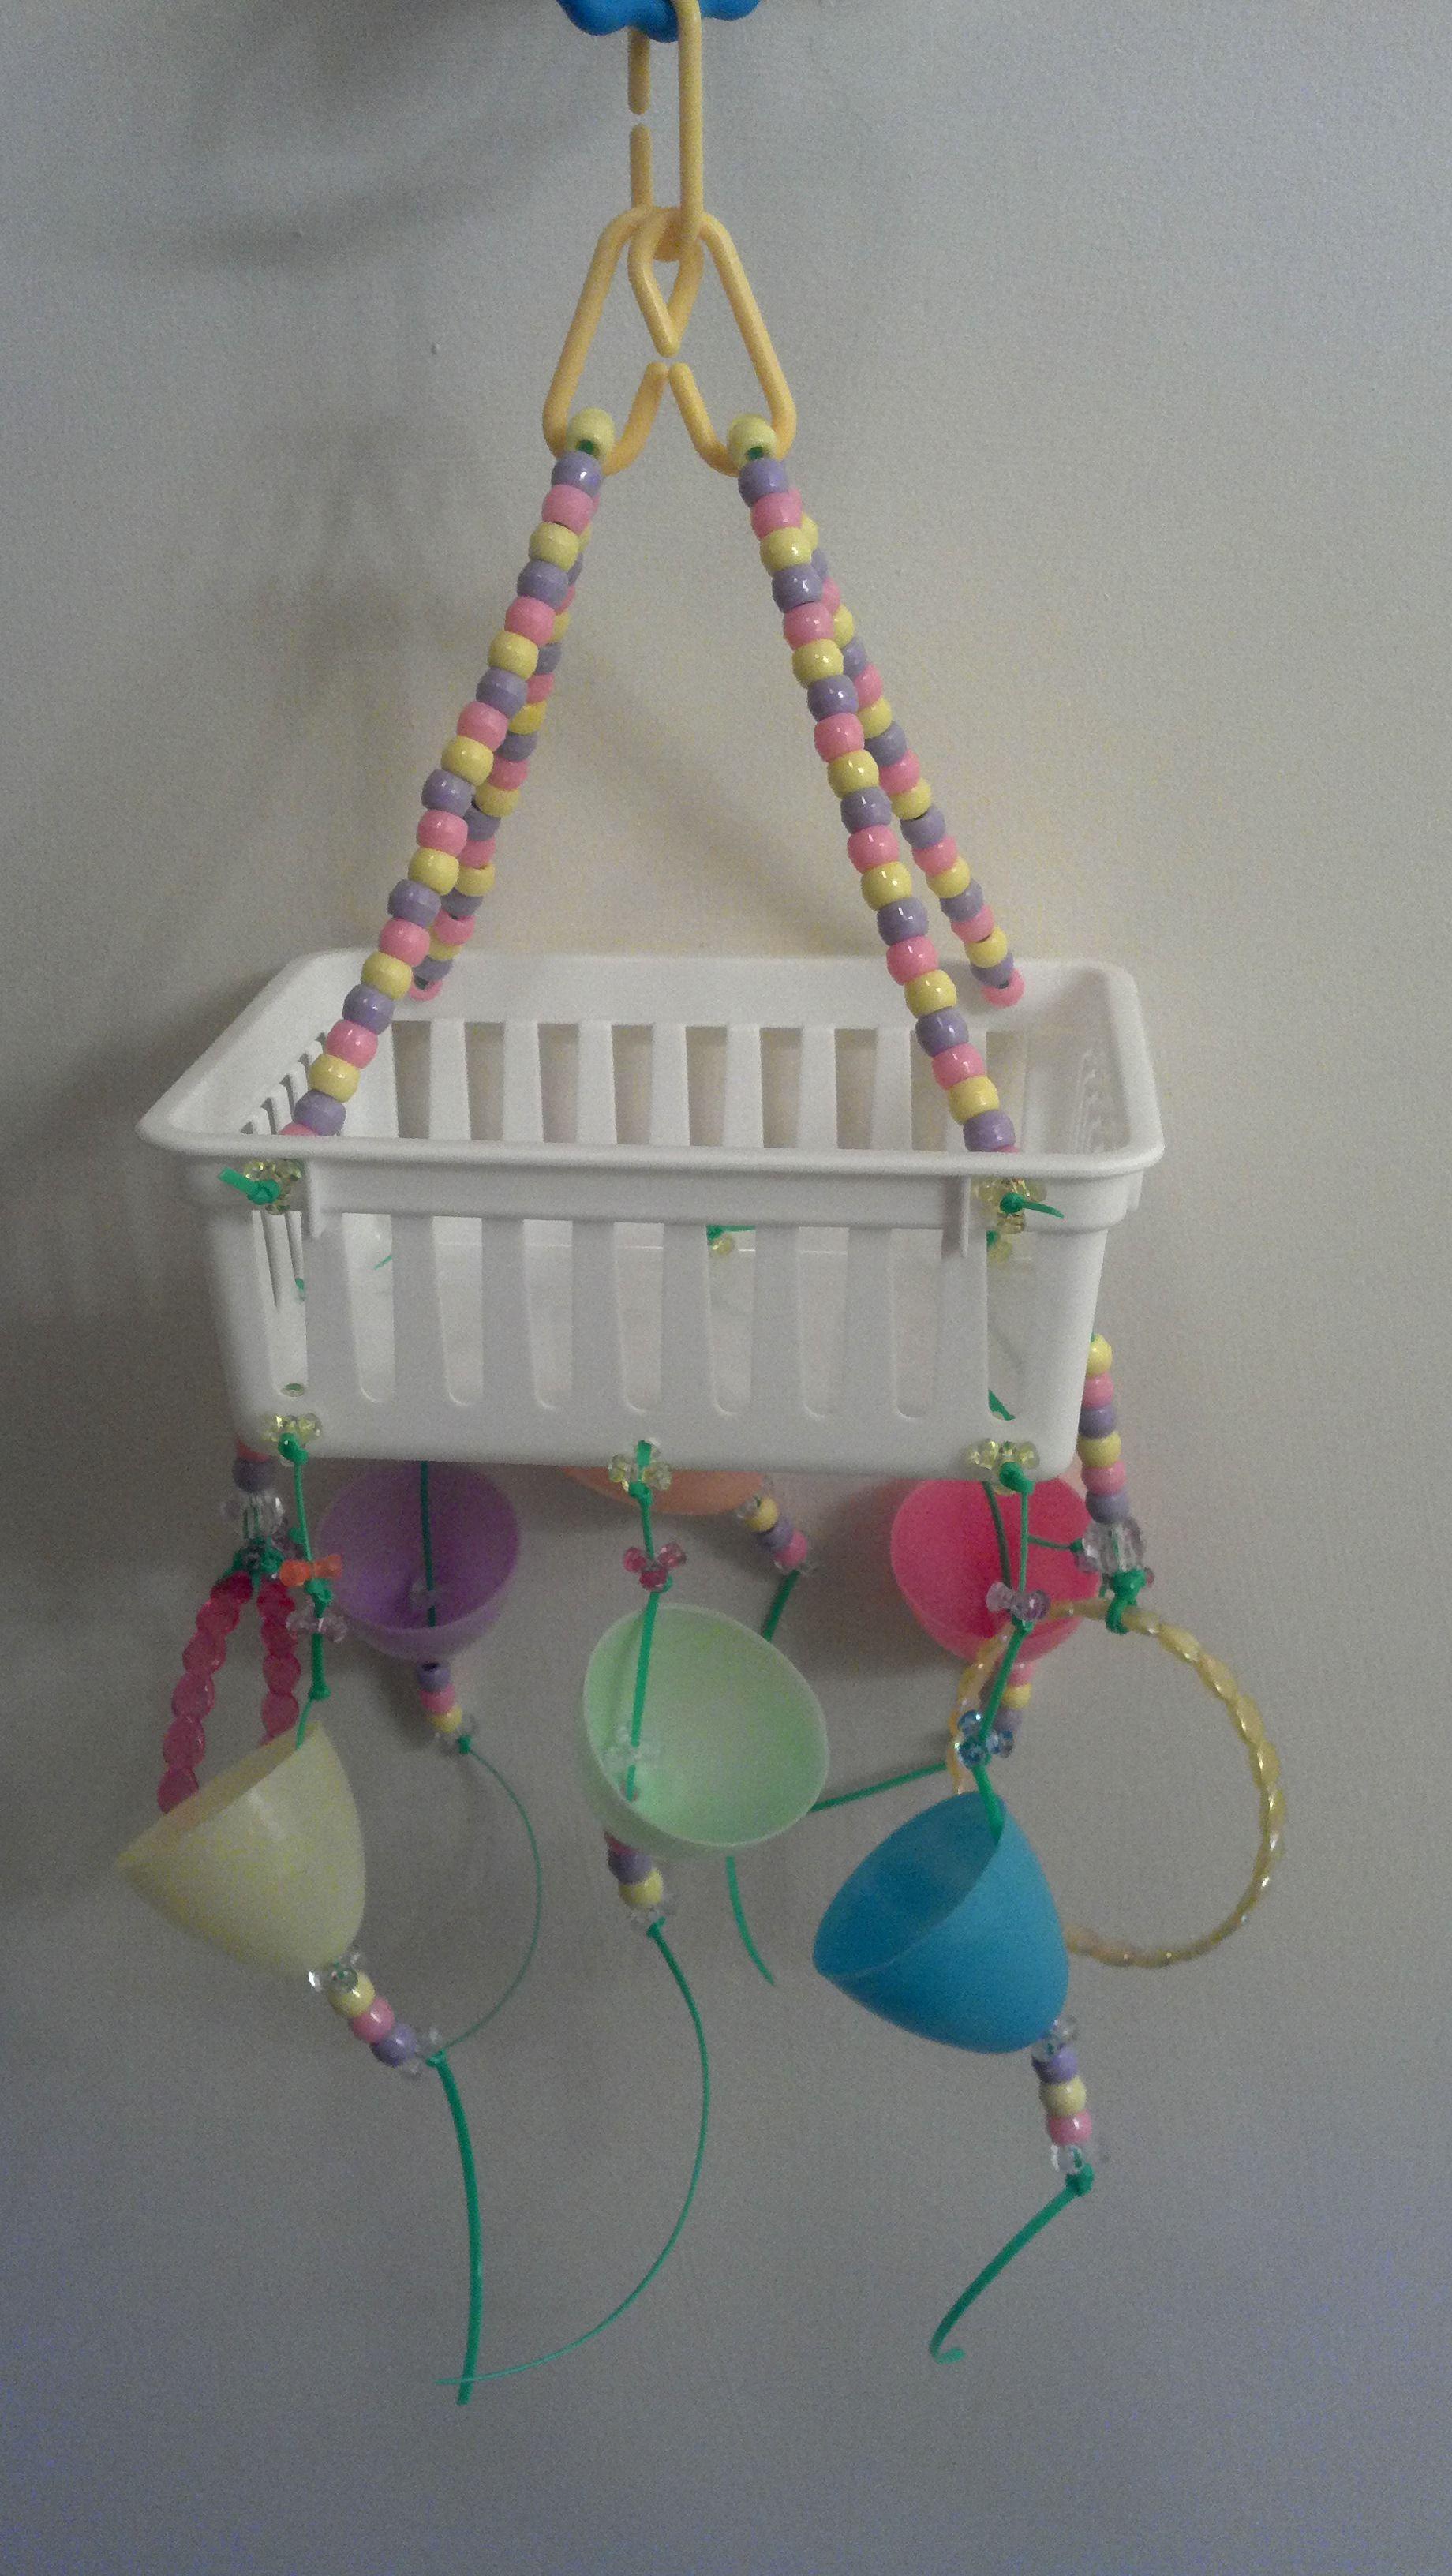 Easter basket swing weaster egg foraging cups sugar